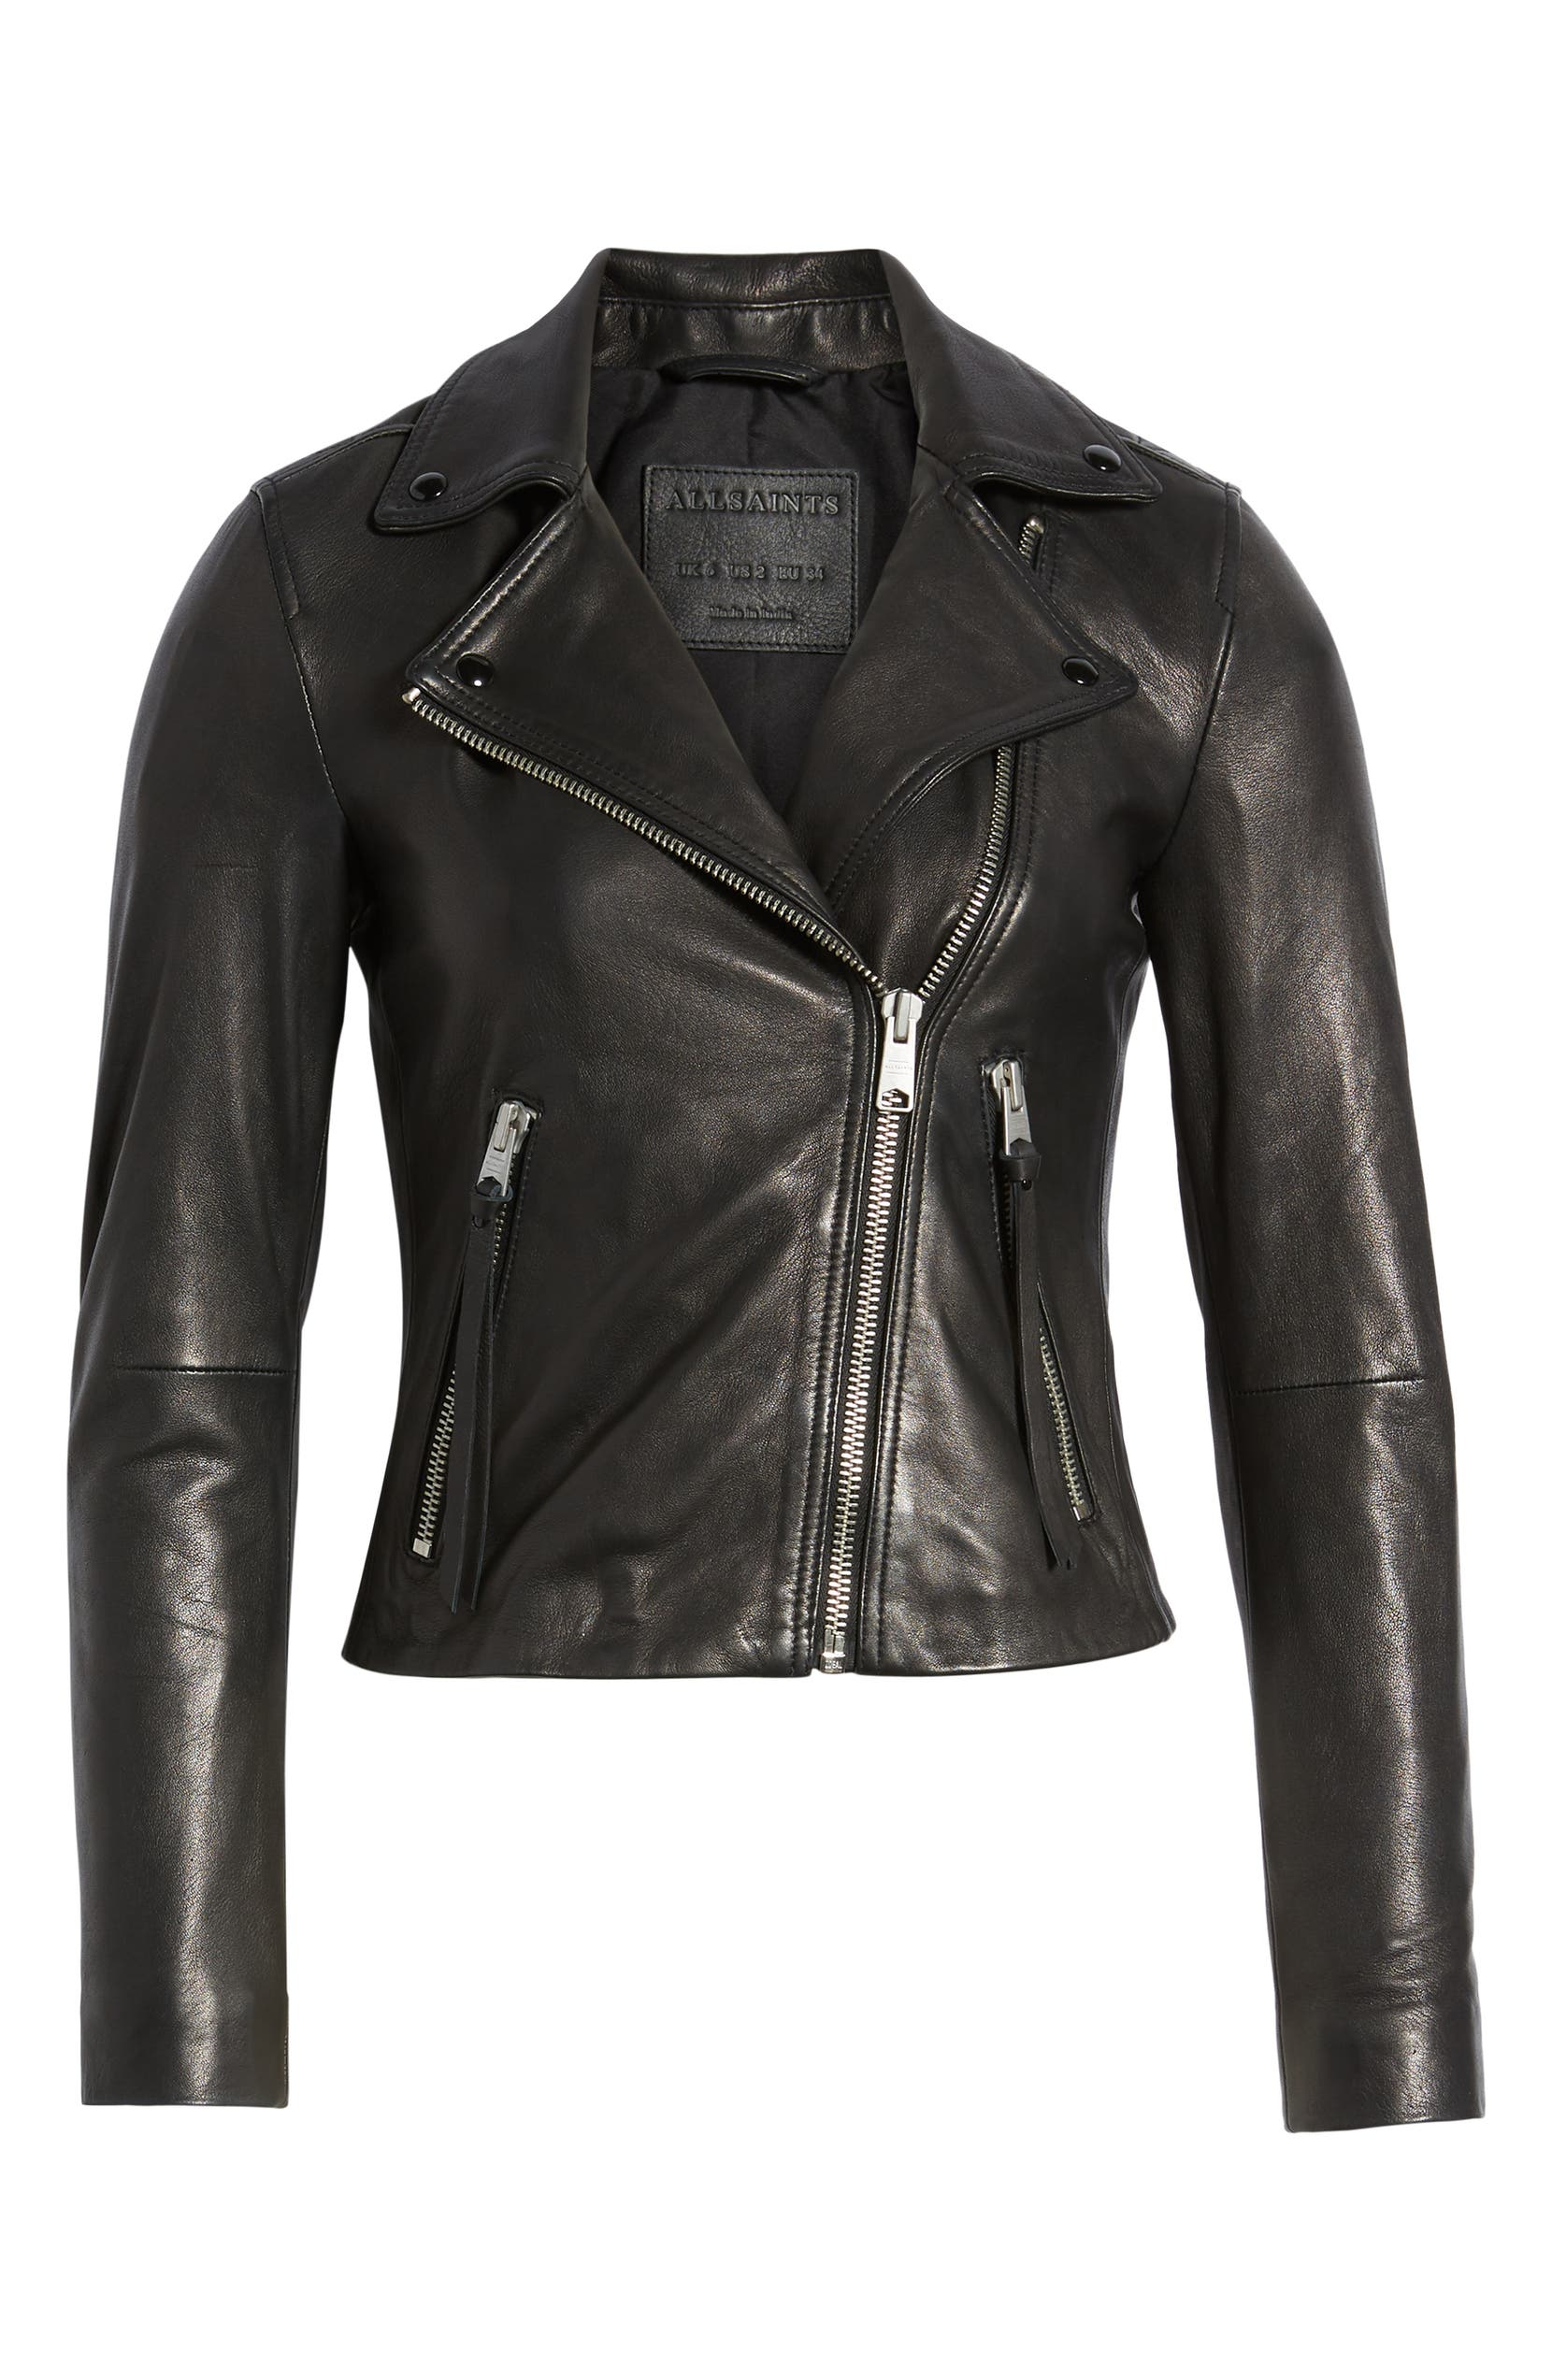 b30e23588 Dalby Leather Biker Jacket